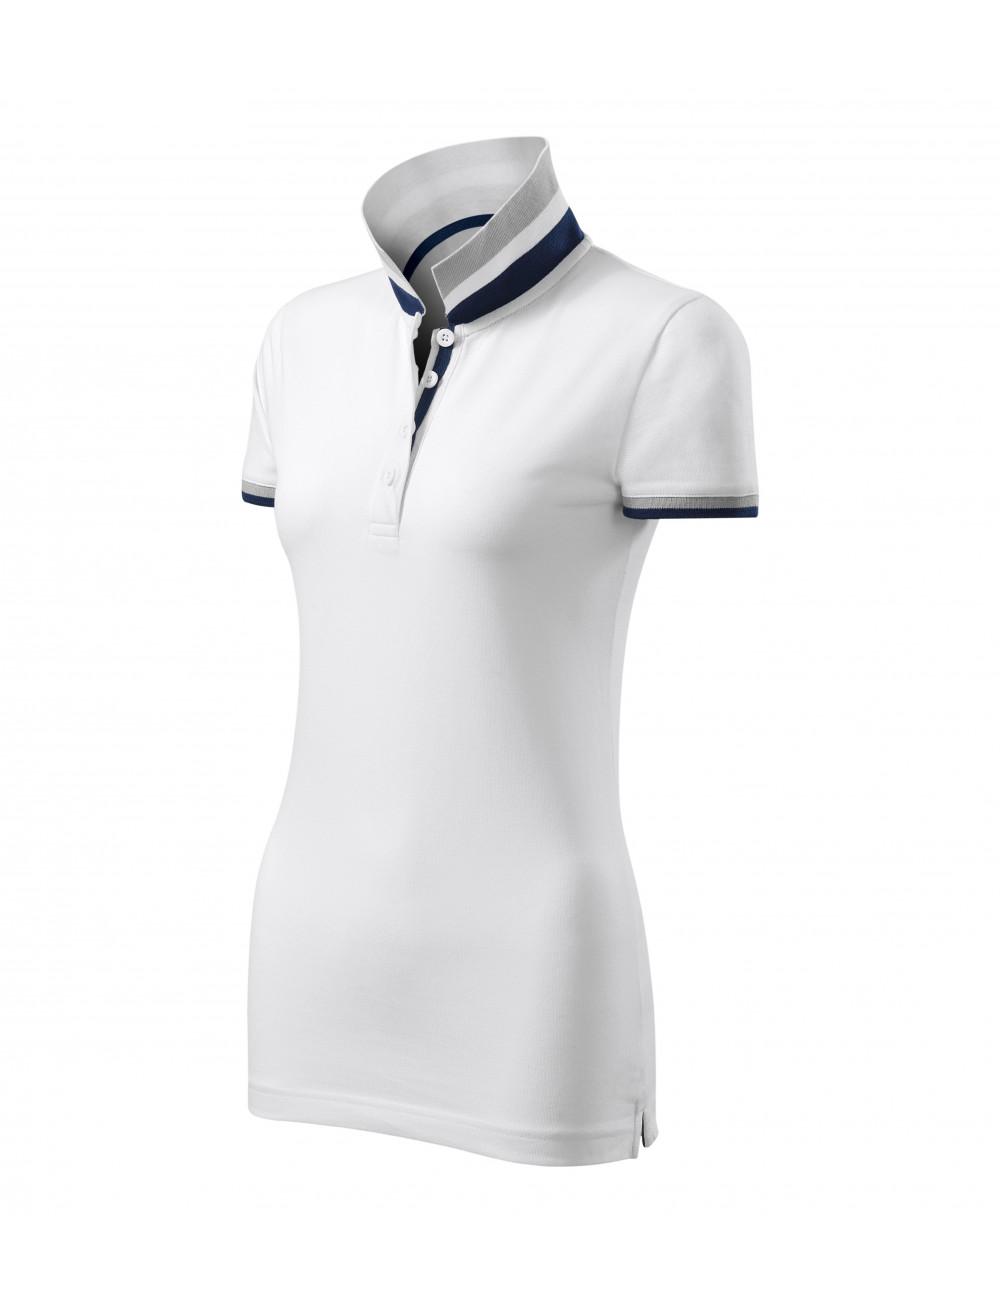 Adler MALFINIPREMIUM Koszulka polo damska Collar Up 257 biały